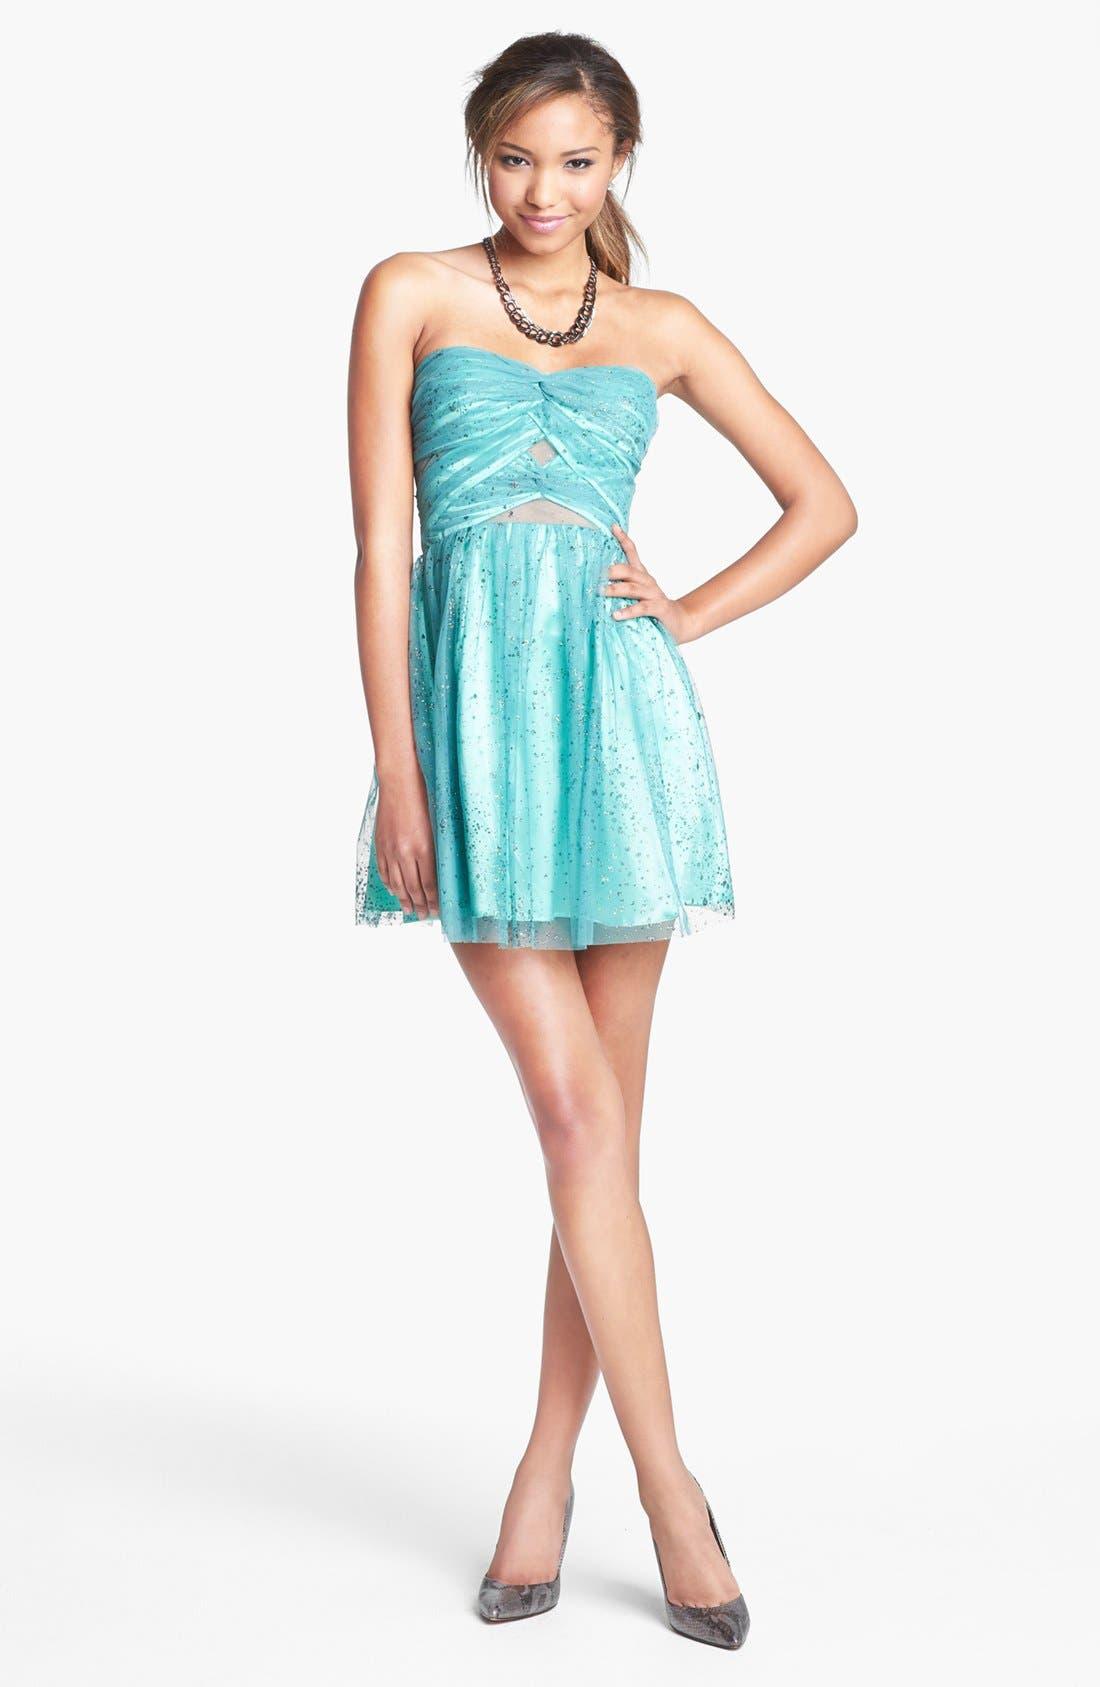 Main Image - Hailey Logan Mesh Inset Glitter Chiffon Fit & Flare Dress (Juniors) (Online Only)